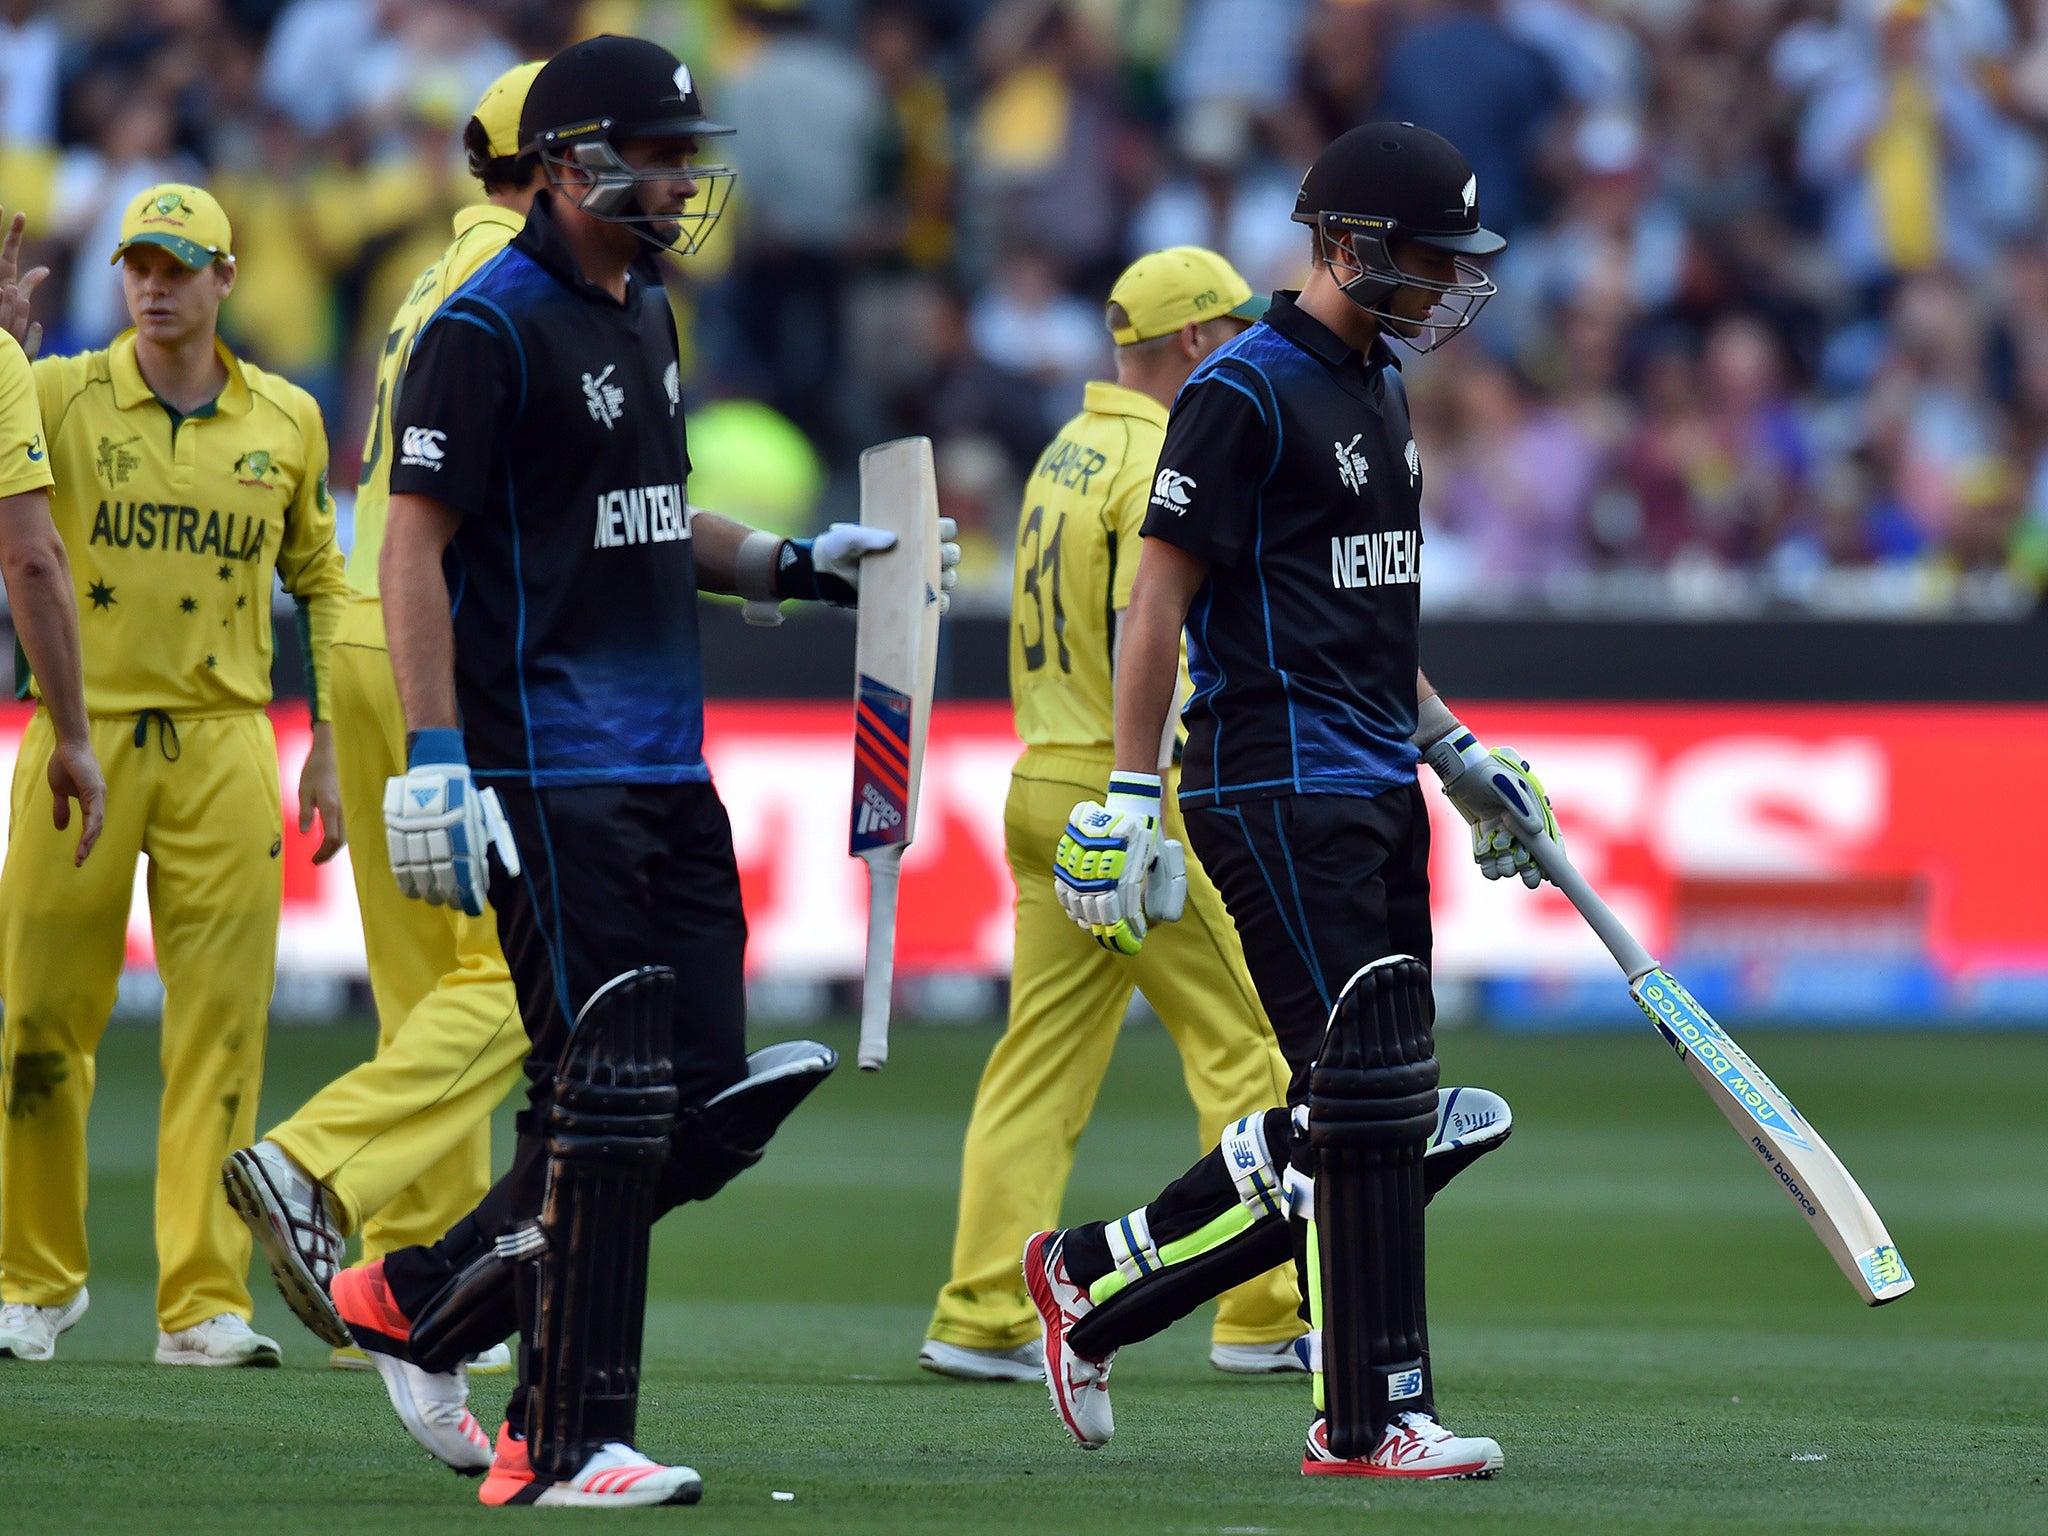 Cricket World Cup 2015: England set tough task to meet new